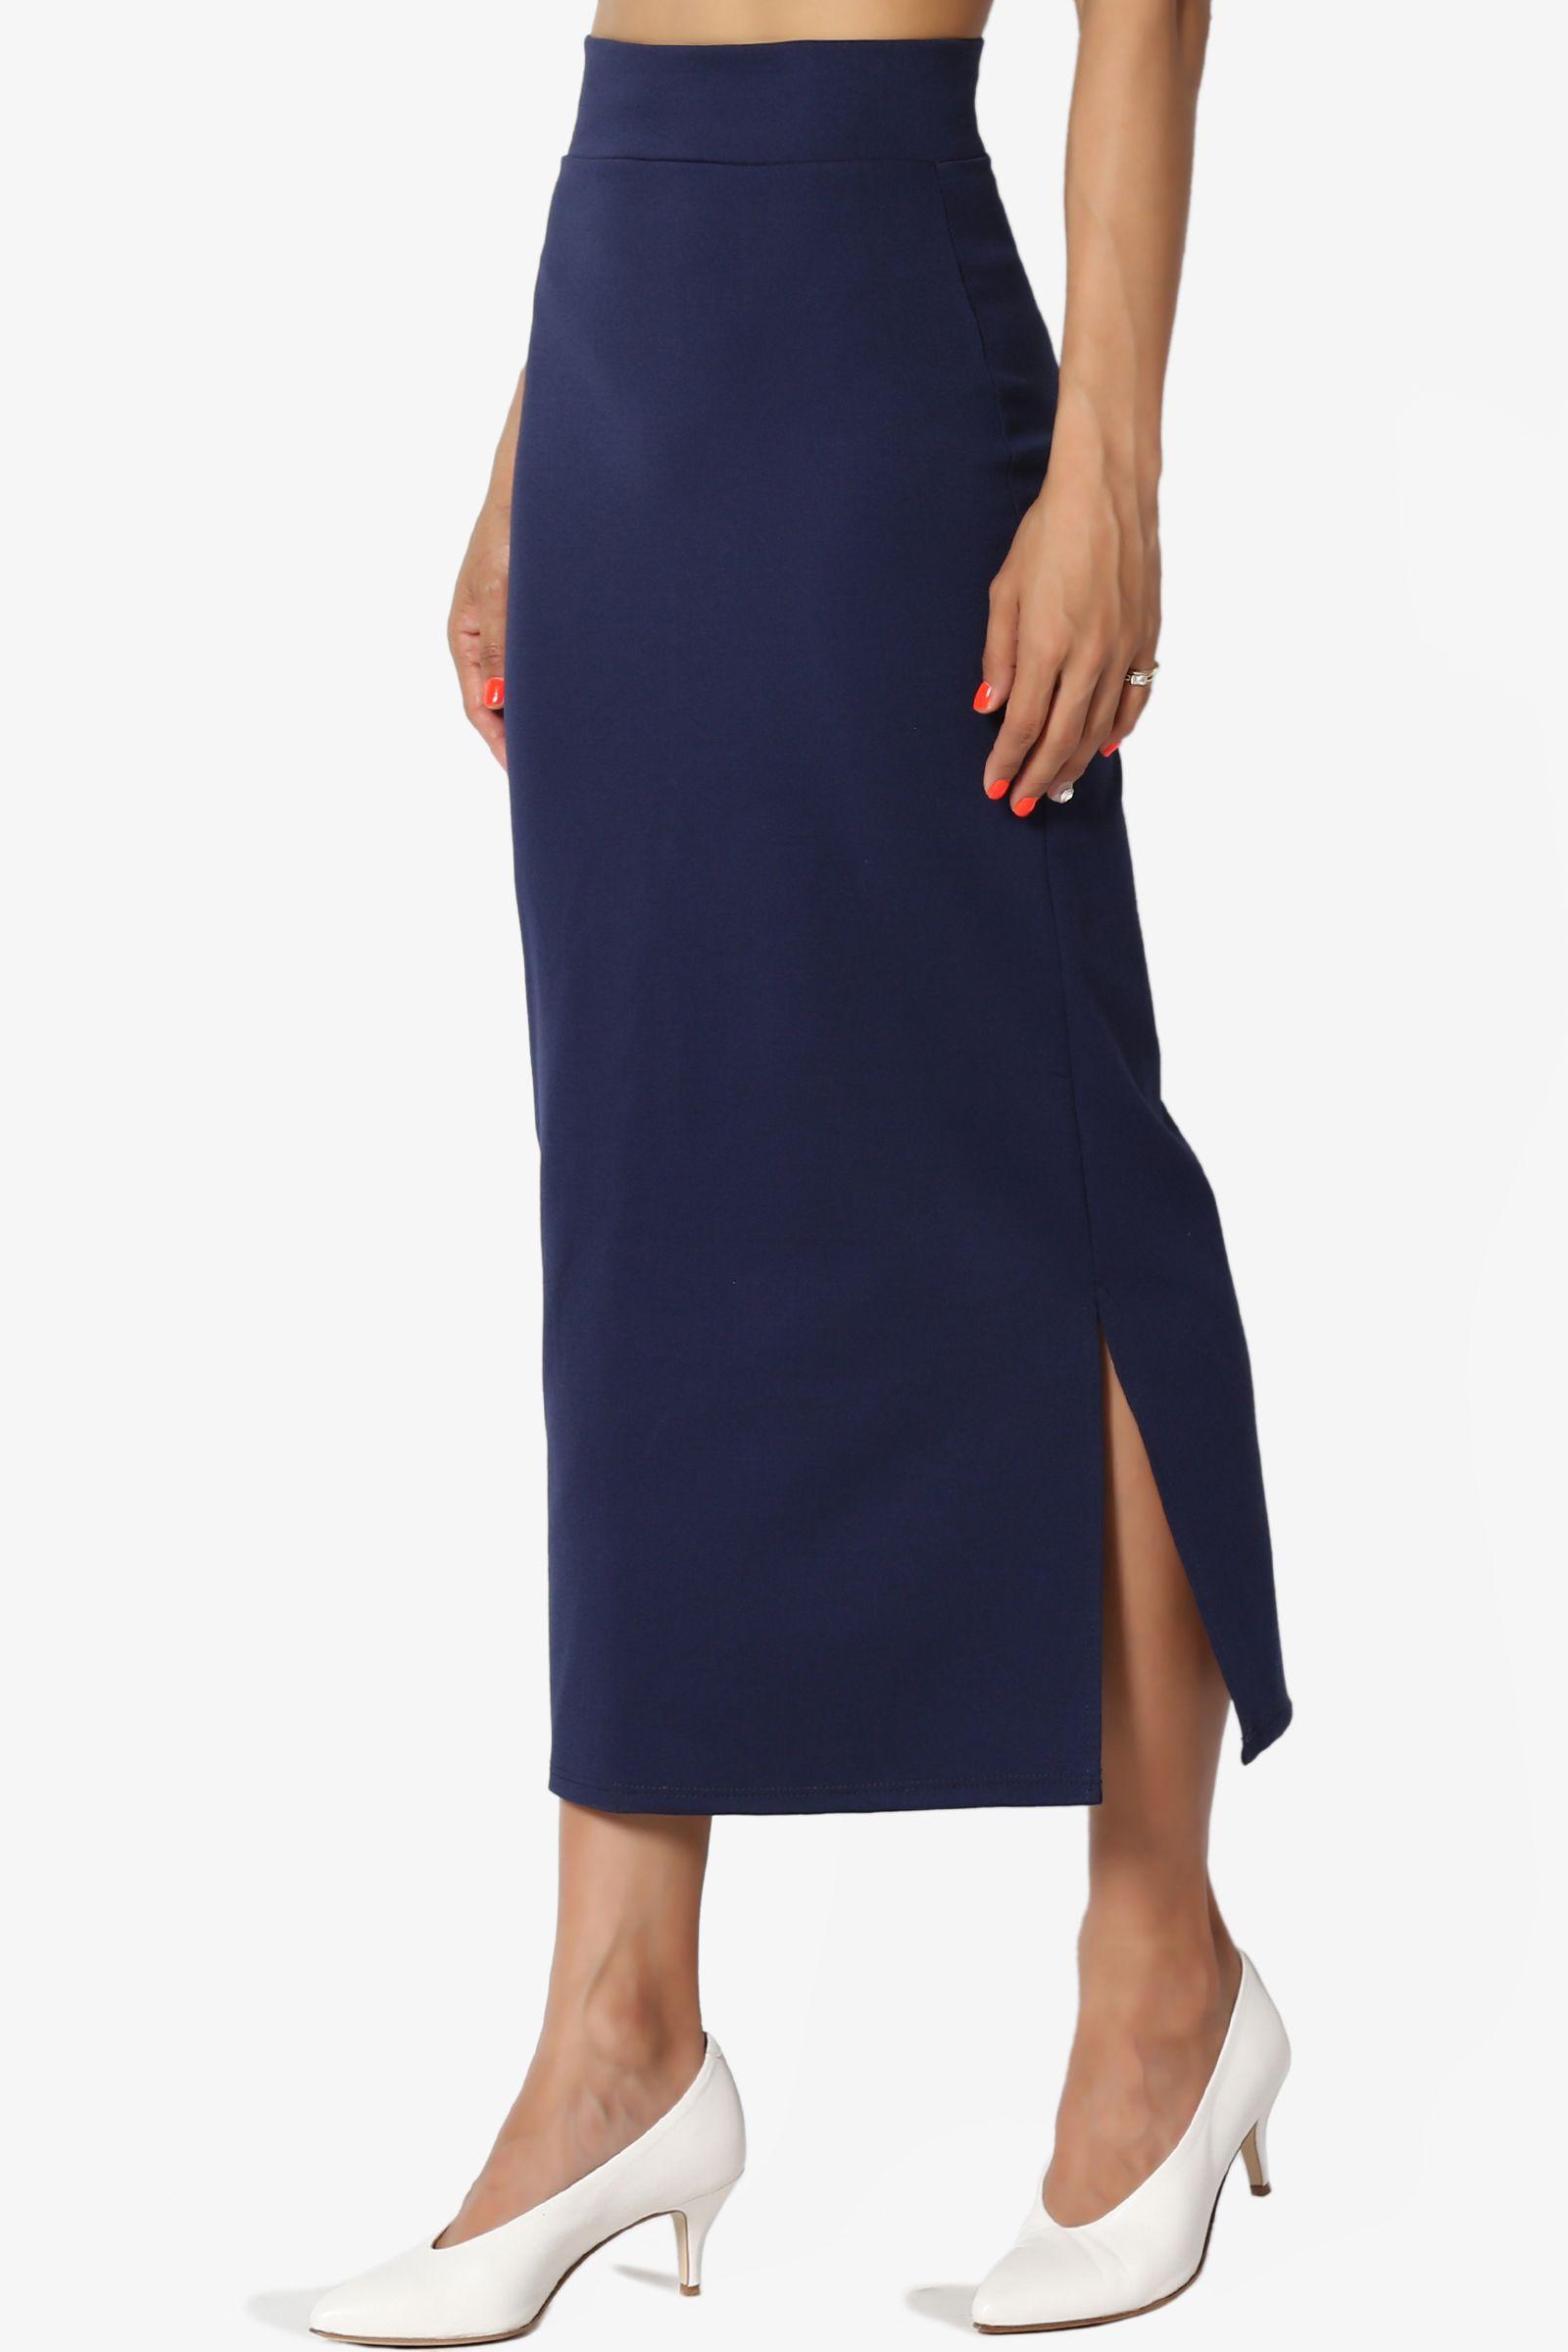 3bf70f6c0c TheMogan Women's S~3X Side Slit Ponte Knit High Waist Mid Calf Long Pencil  Skirt #Ad #Slit, #AFFILIATE, #Ponte, #Knit